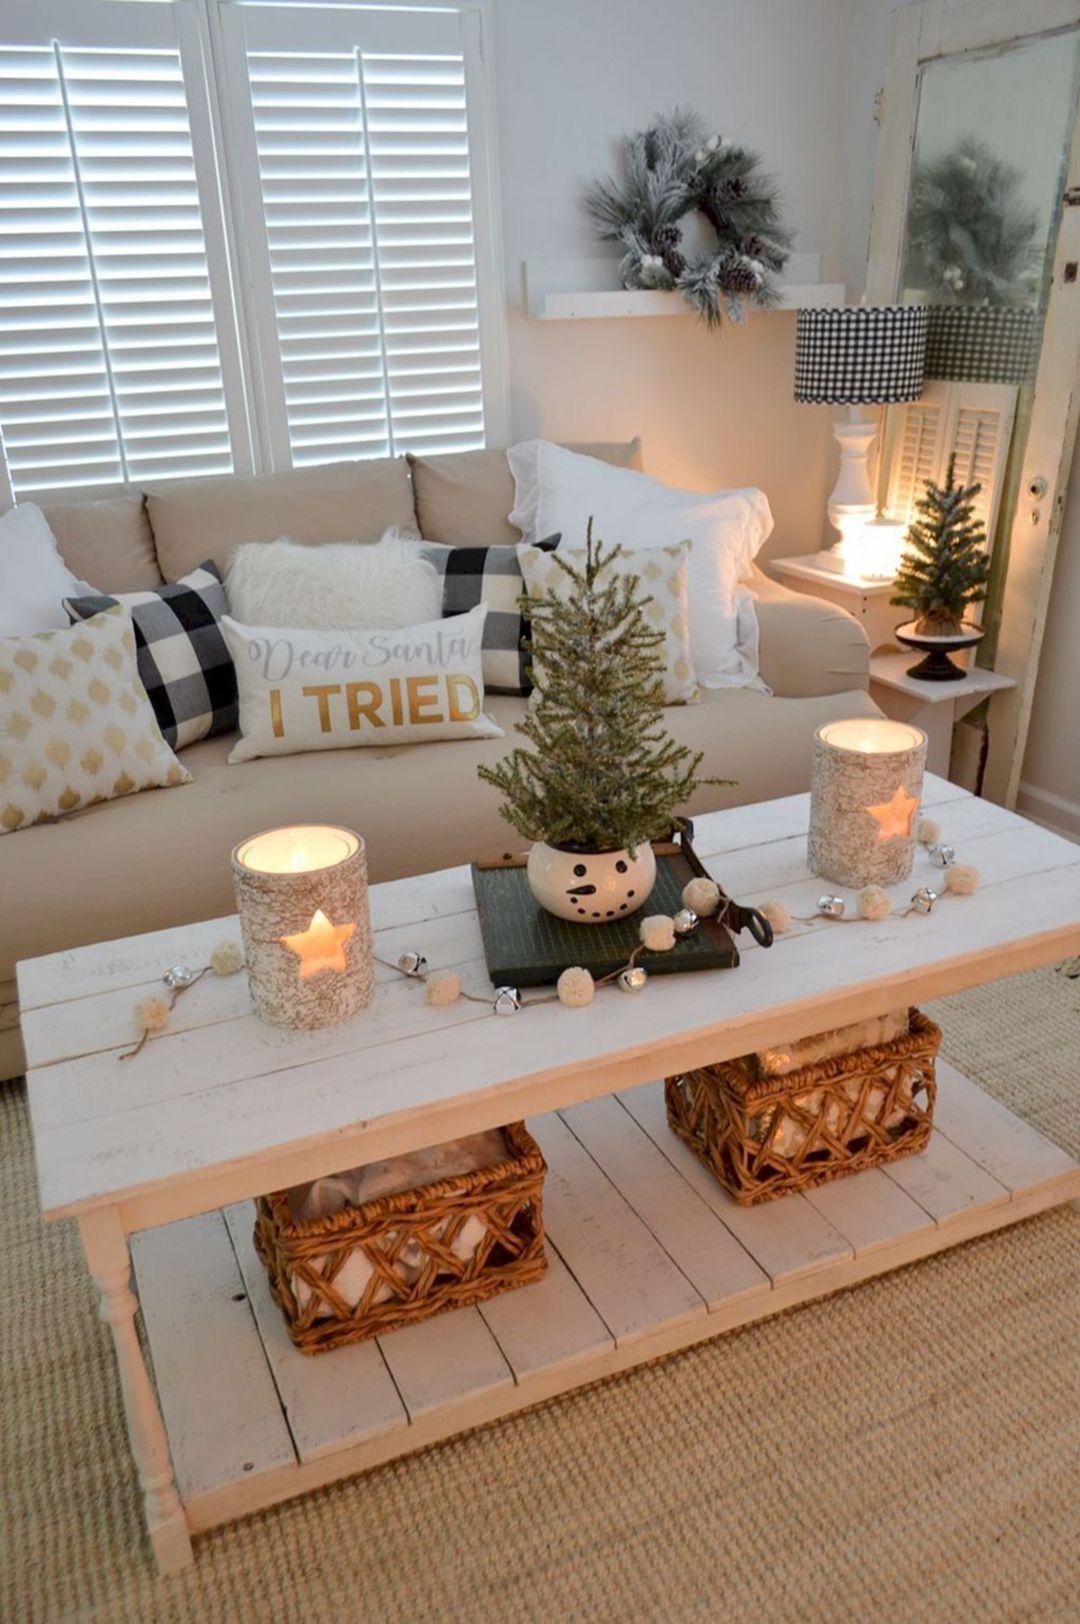 30 Tiny Living Room Apartment Design Ideas For Your Apartment #tinylivingideas